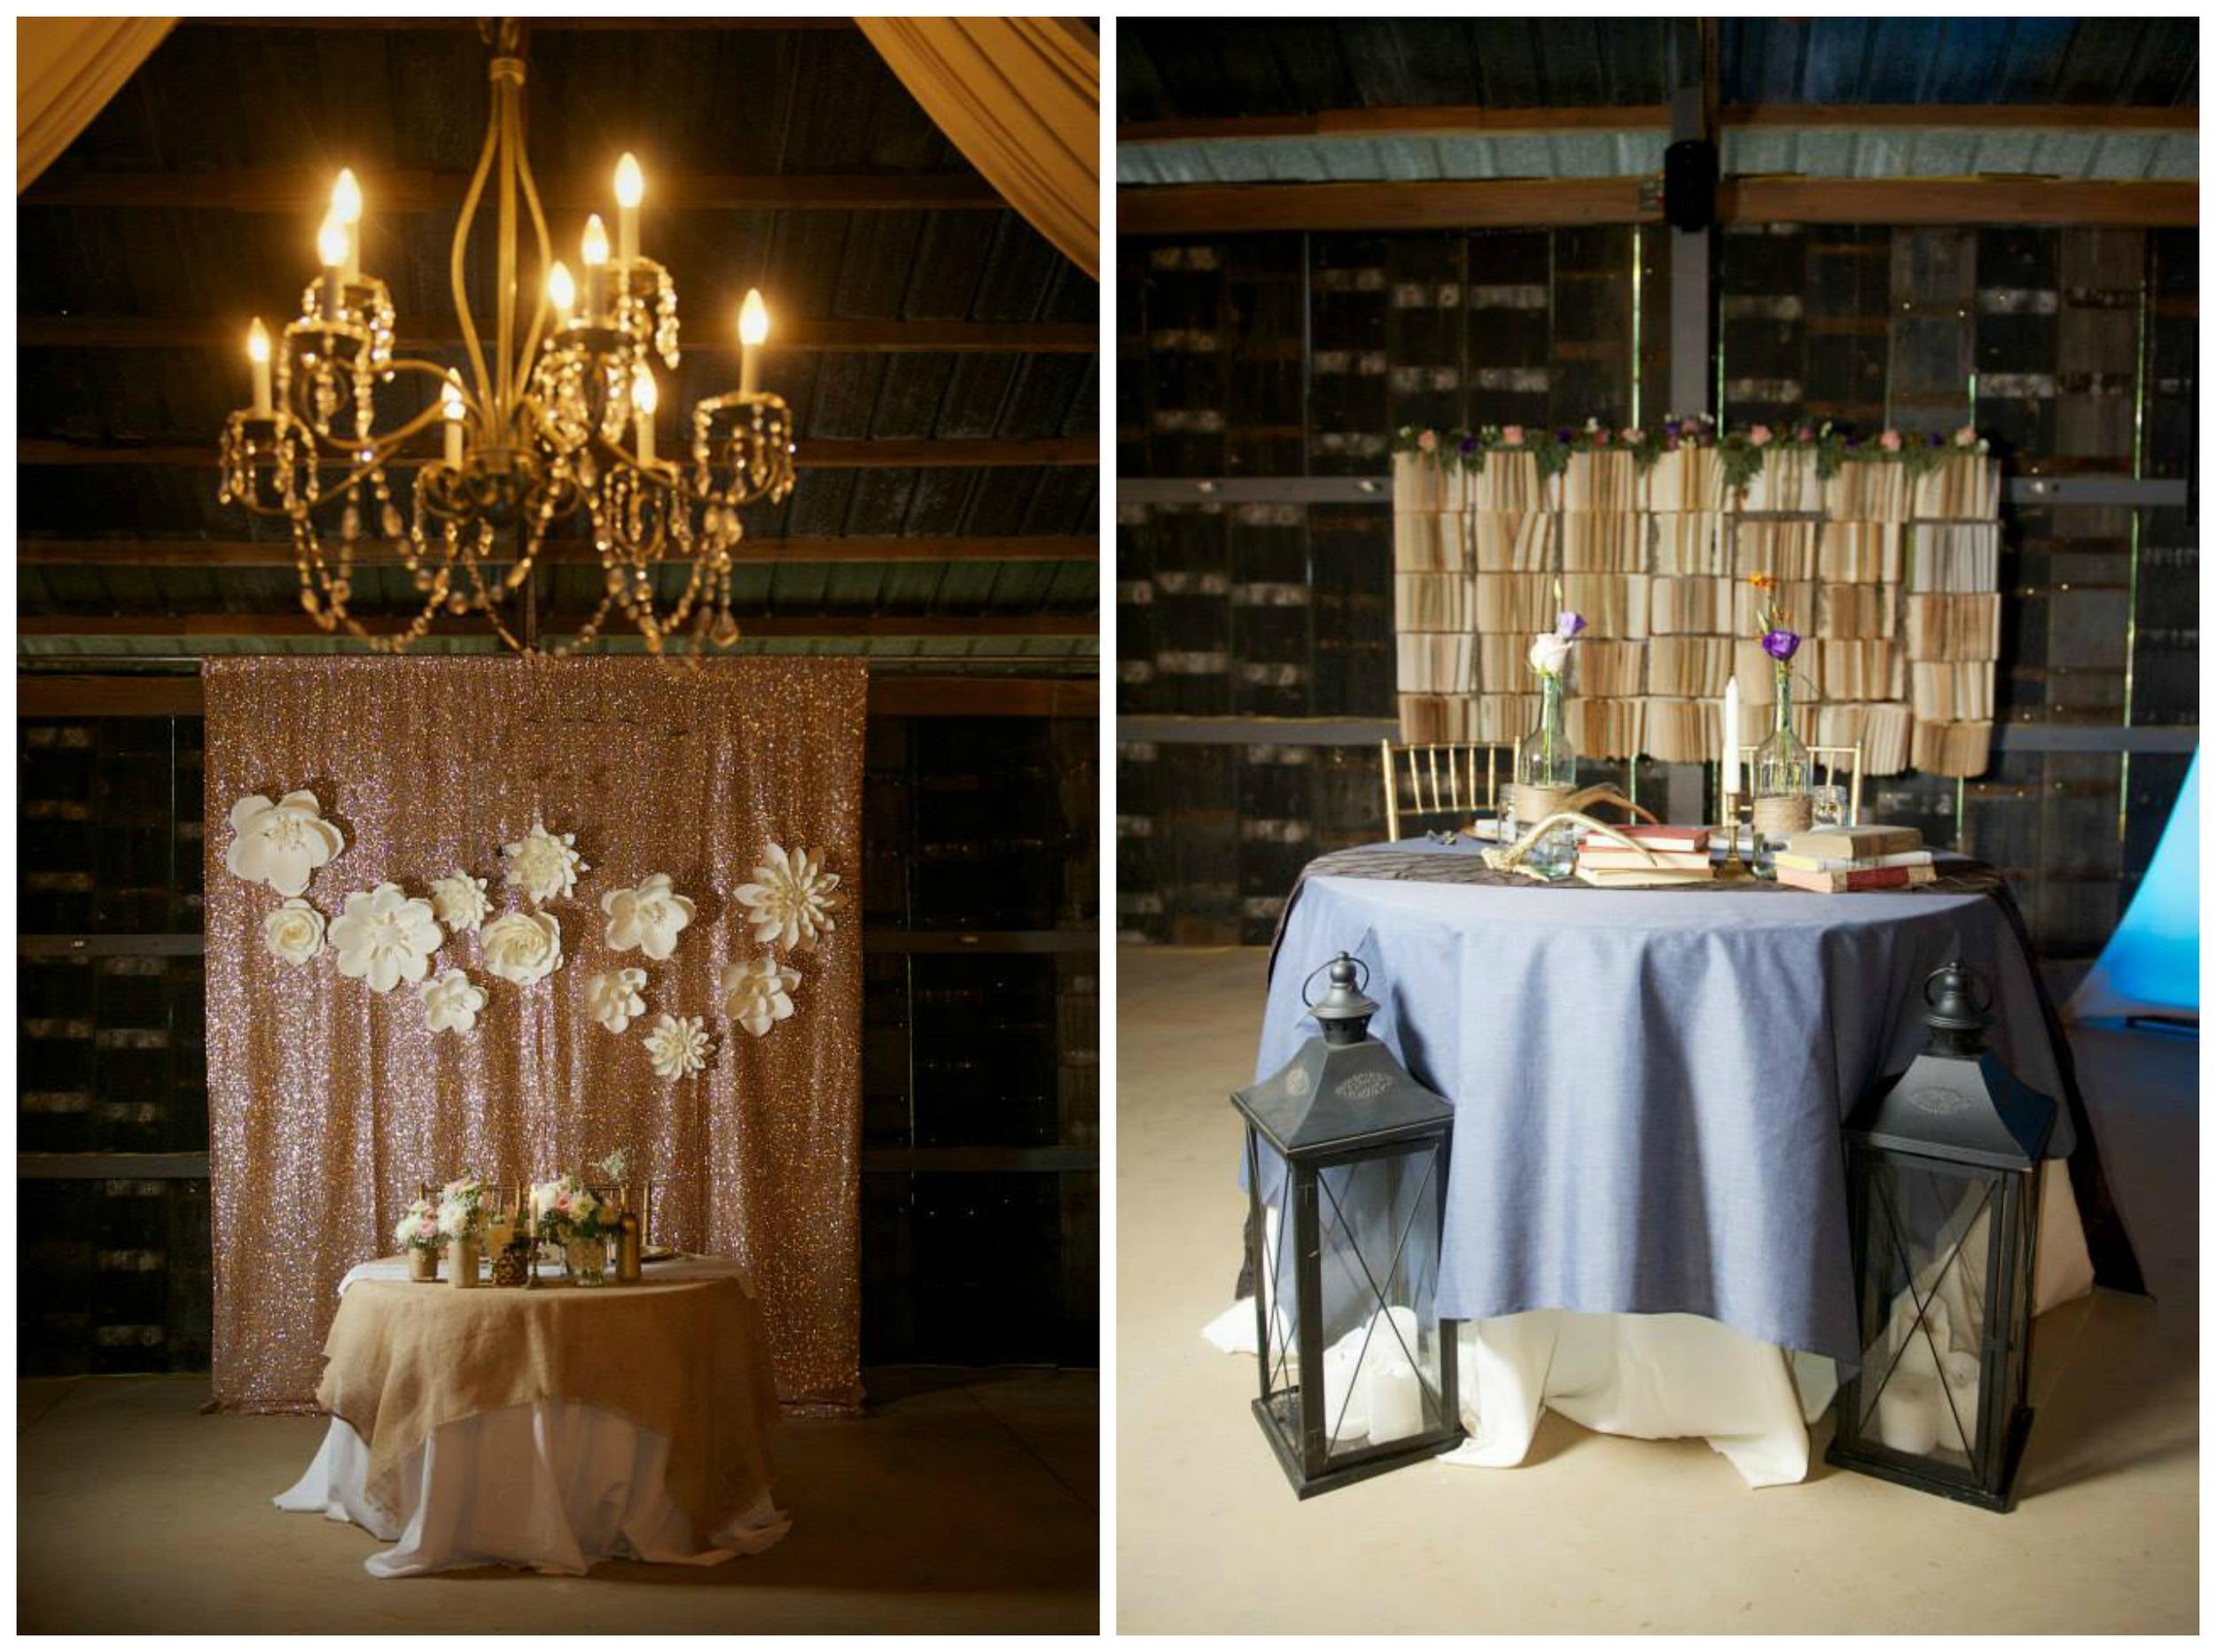 Danielle Davis Art/Photography , from  Ashton + Mickey 's wedding and  Emily + Blake 's wedding at The Barn